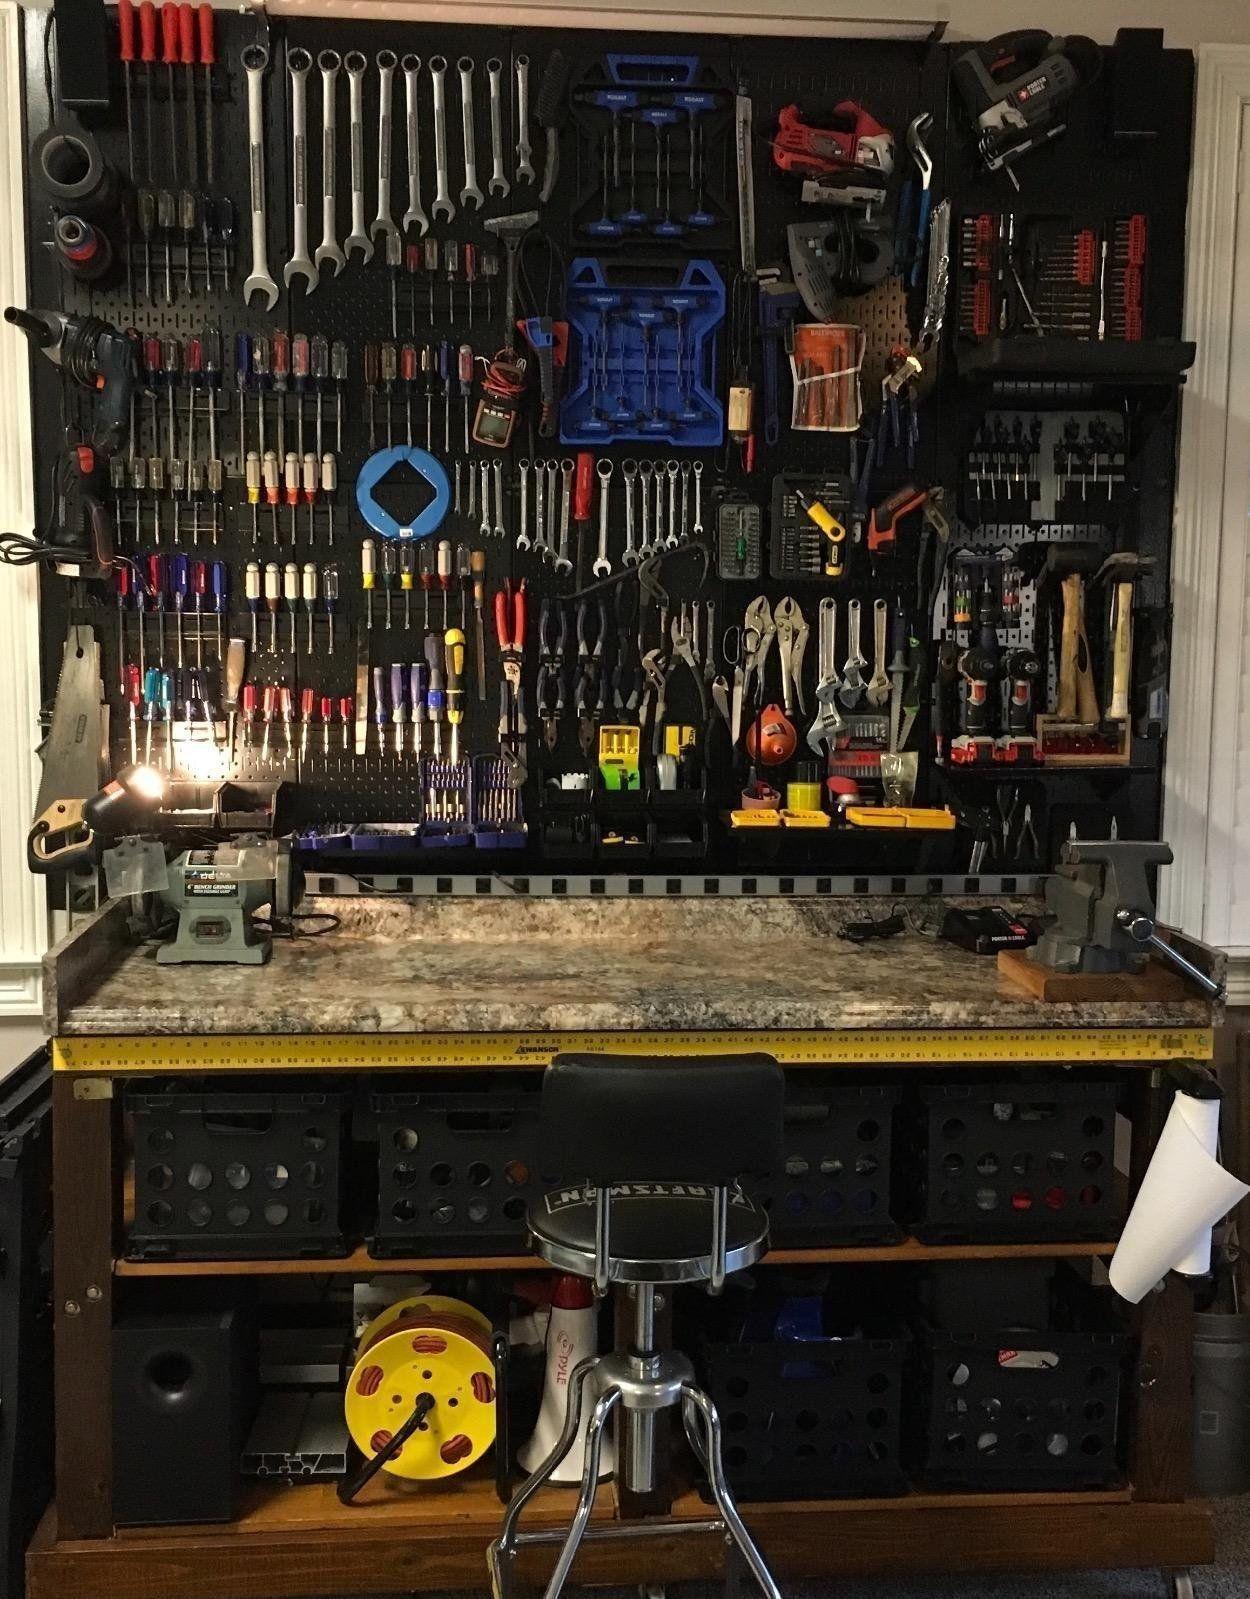 Wall Control 30 Wrk 400 Gbu Pegboard Organizer 4 Metal Standard Tool Storage Kit With Gray Tool Board And Blue Access Man Garage Man Cave Garage Garage Design